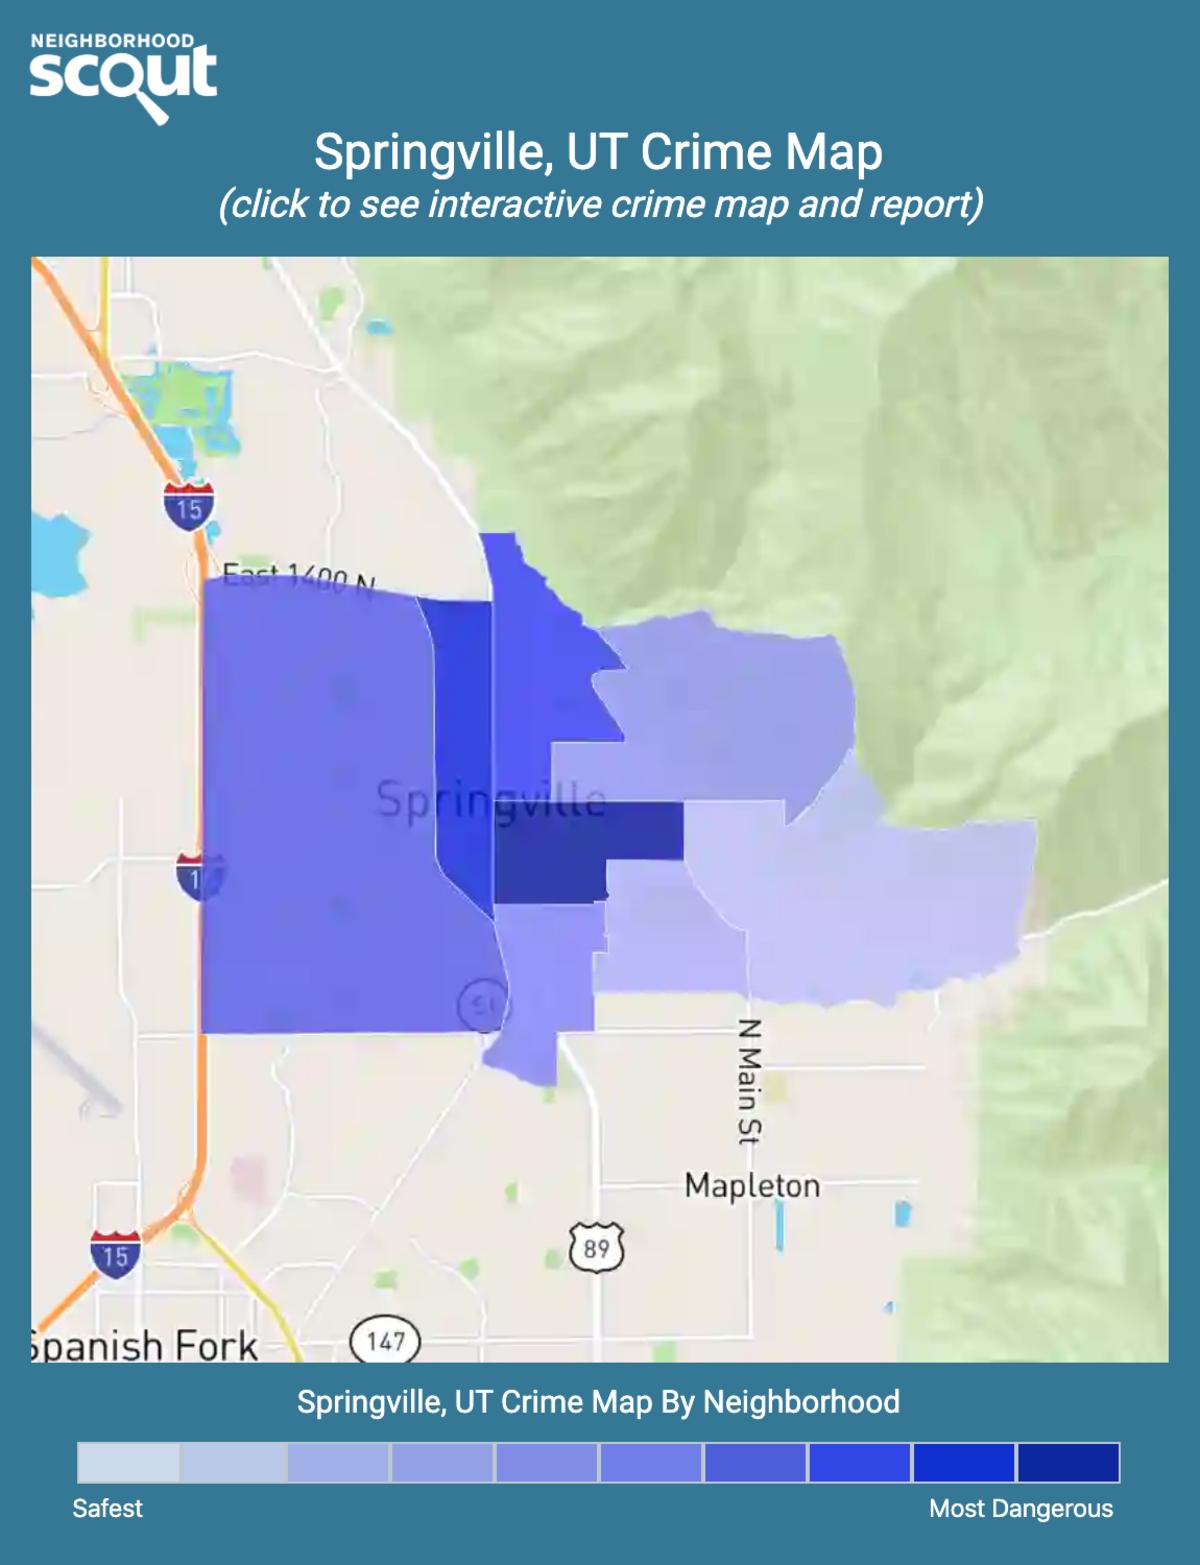 Springville, Utah crime map